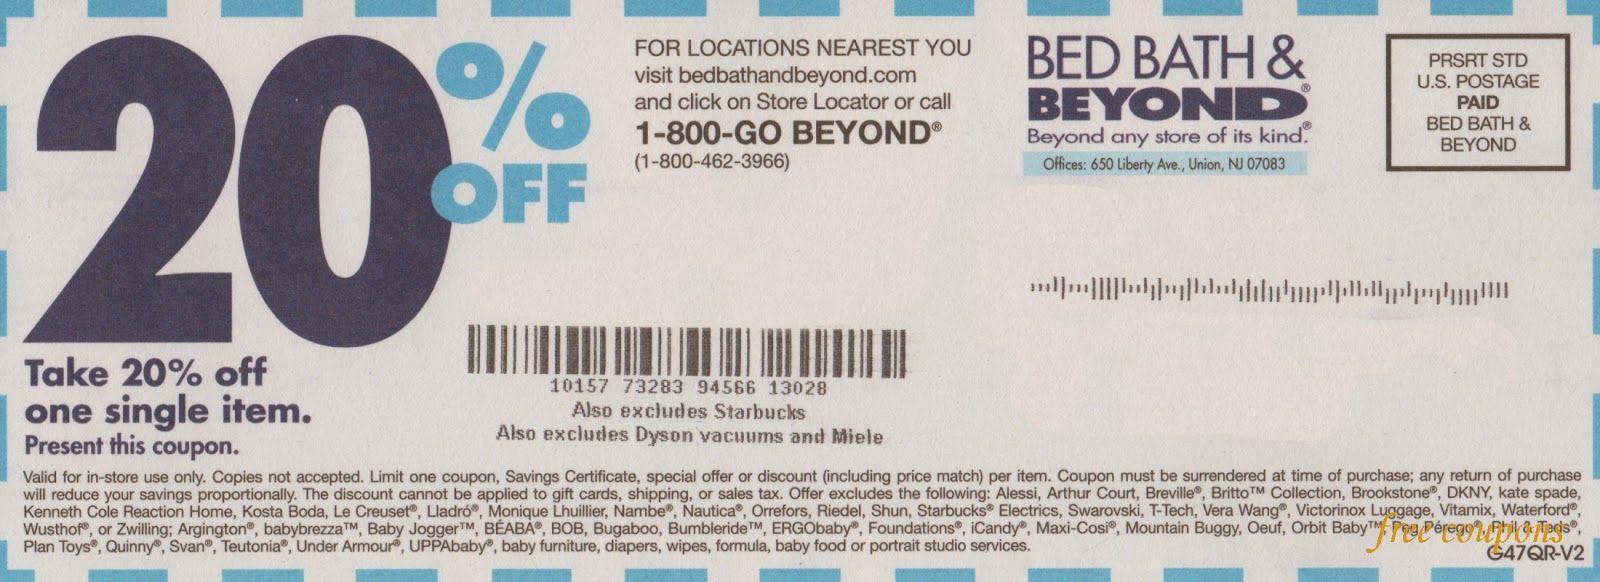 Bed Bath And Beyond Coupons Bath And Beyond Coupon Printable Coupons Bed Bath And Beyond